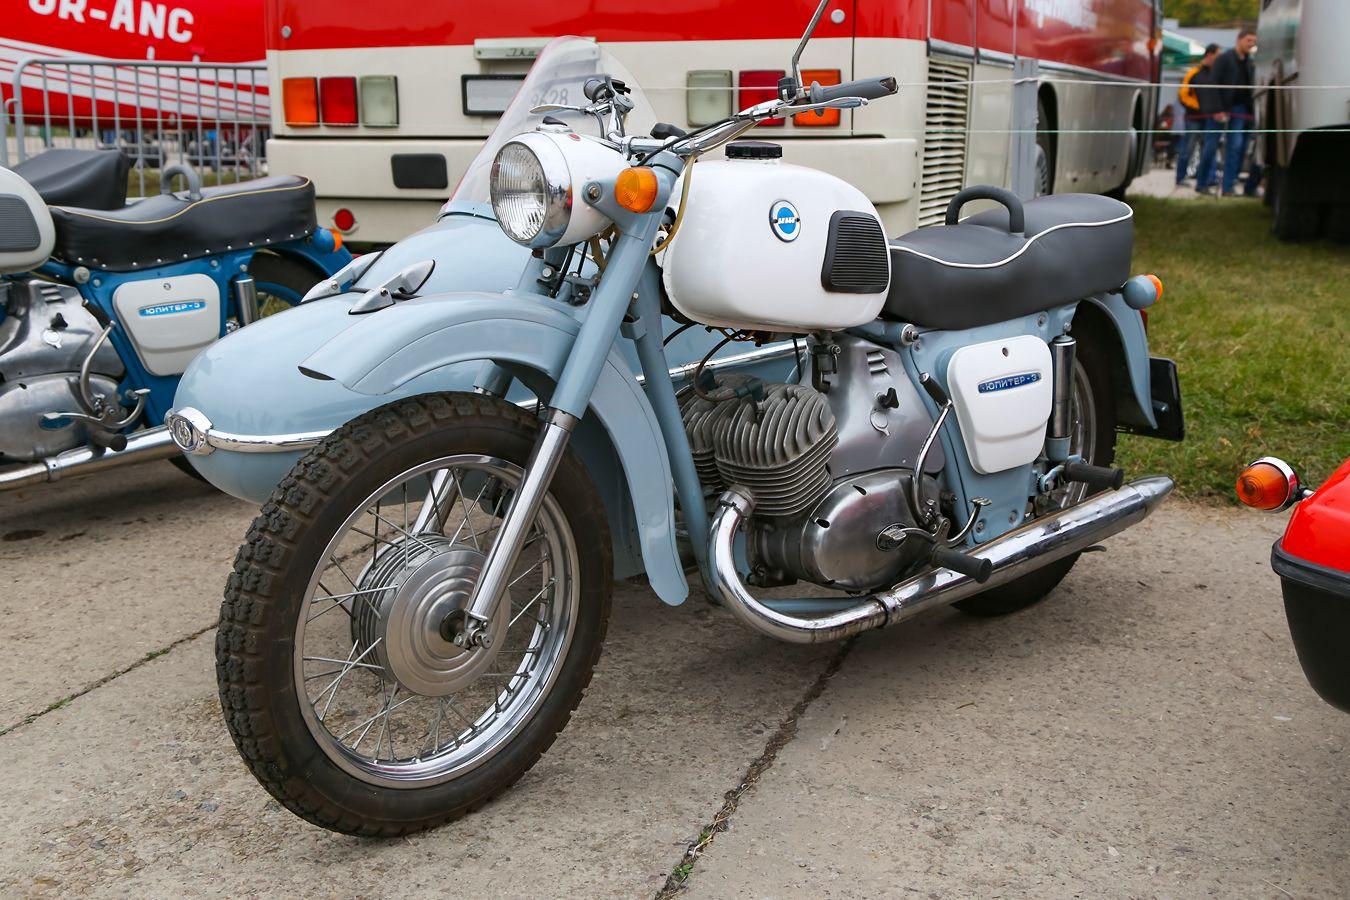 Иж Юпитер-3. Мотоцикл Иж Юпитер-3 ретро oldtimer